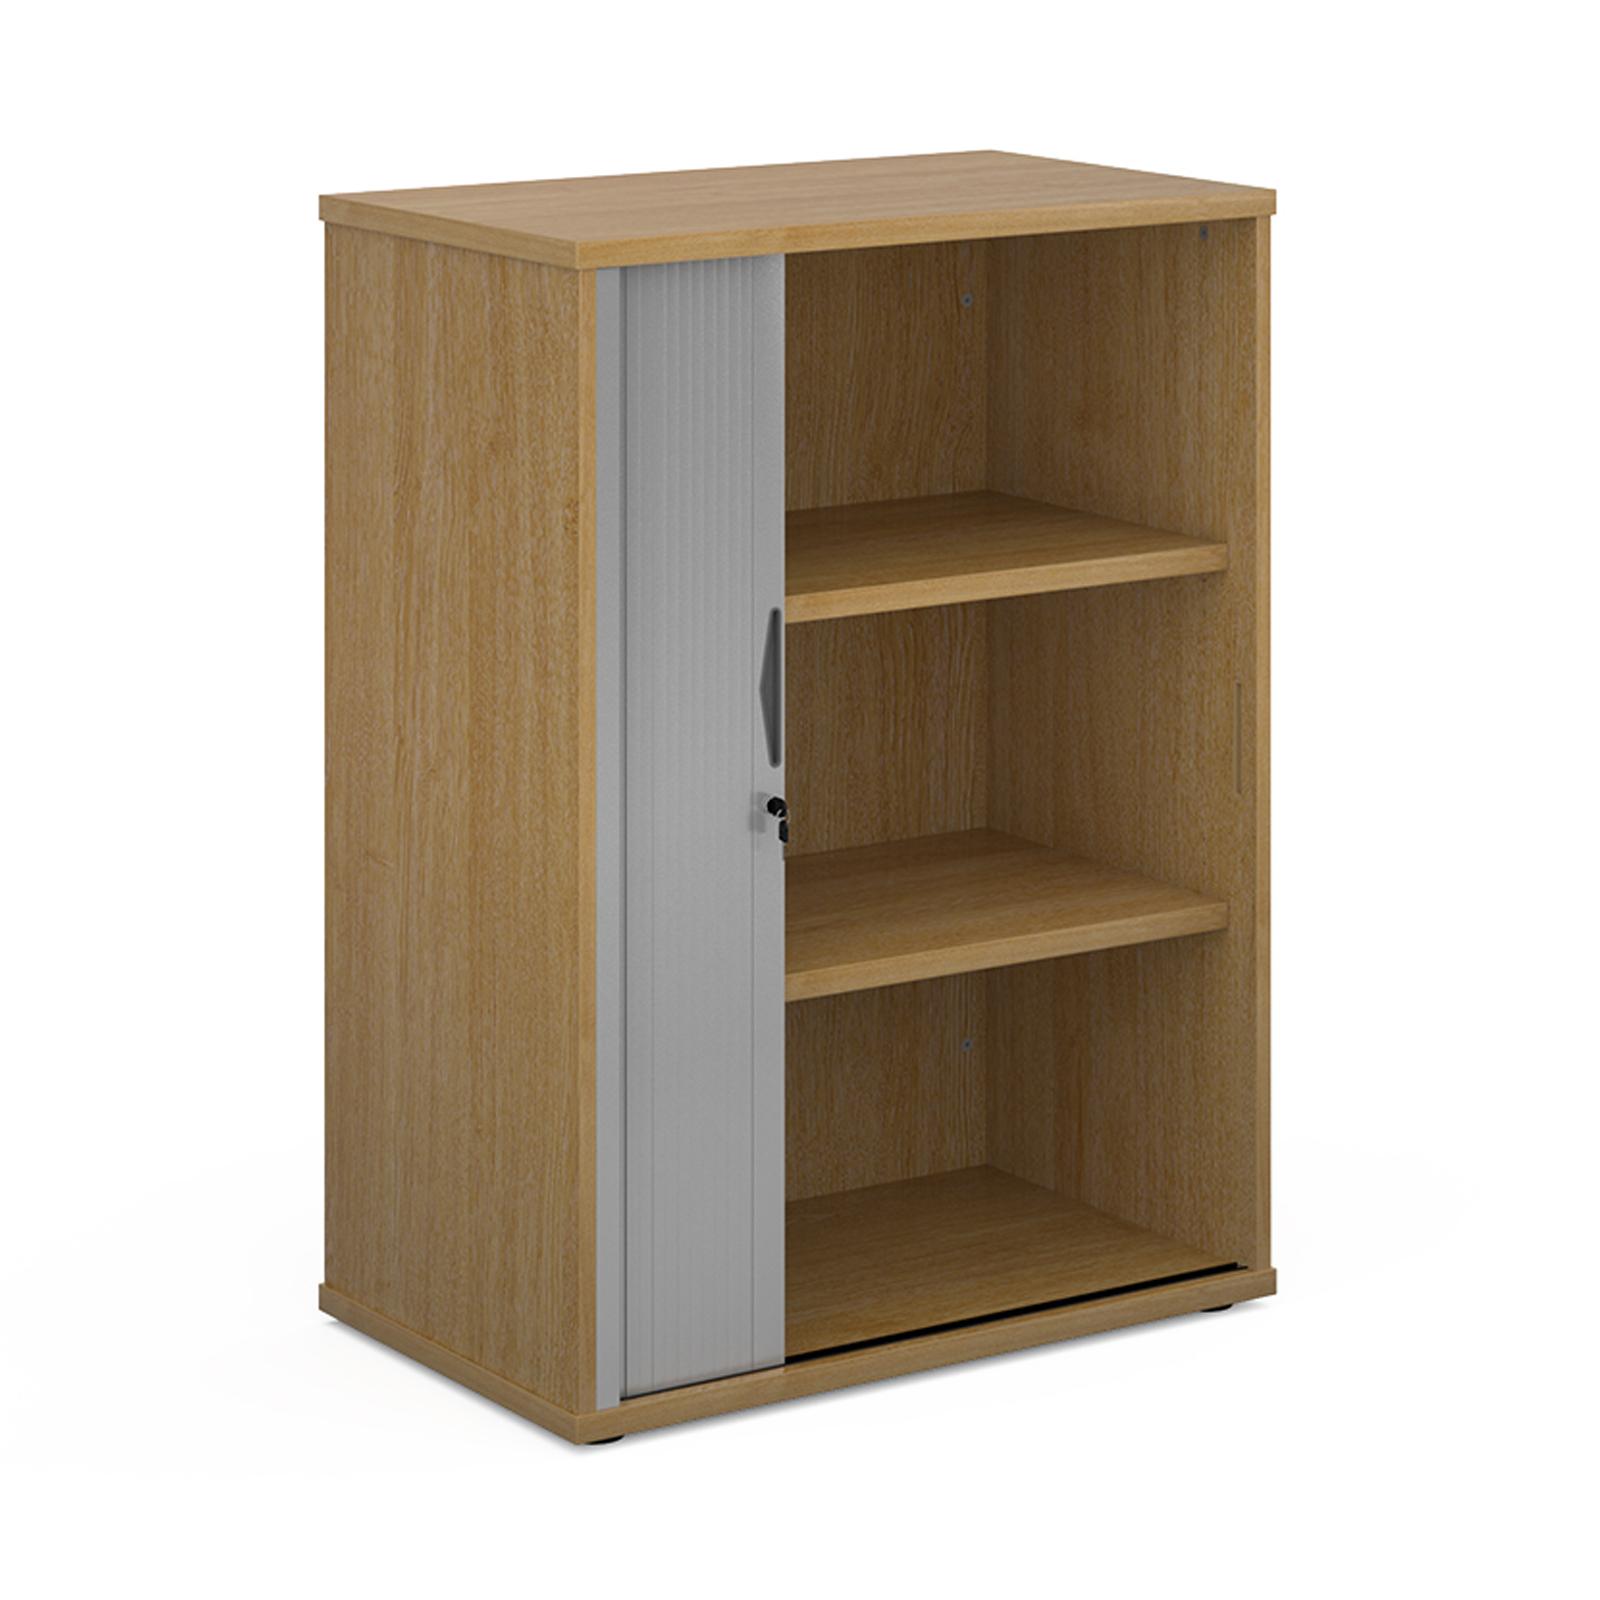 Up to 1200mm High Universal single door tambour cupboard 1090mm high with 2 shelves - oak with silver door